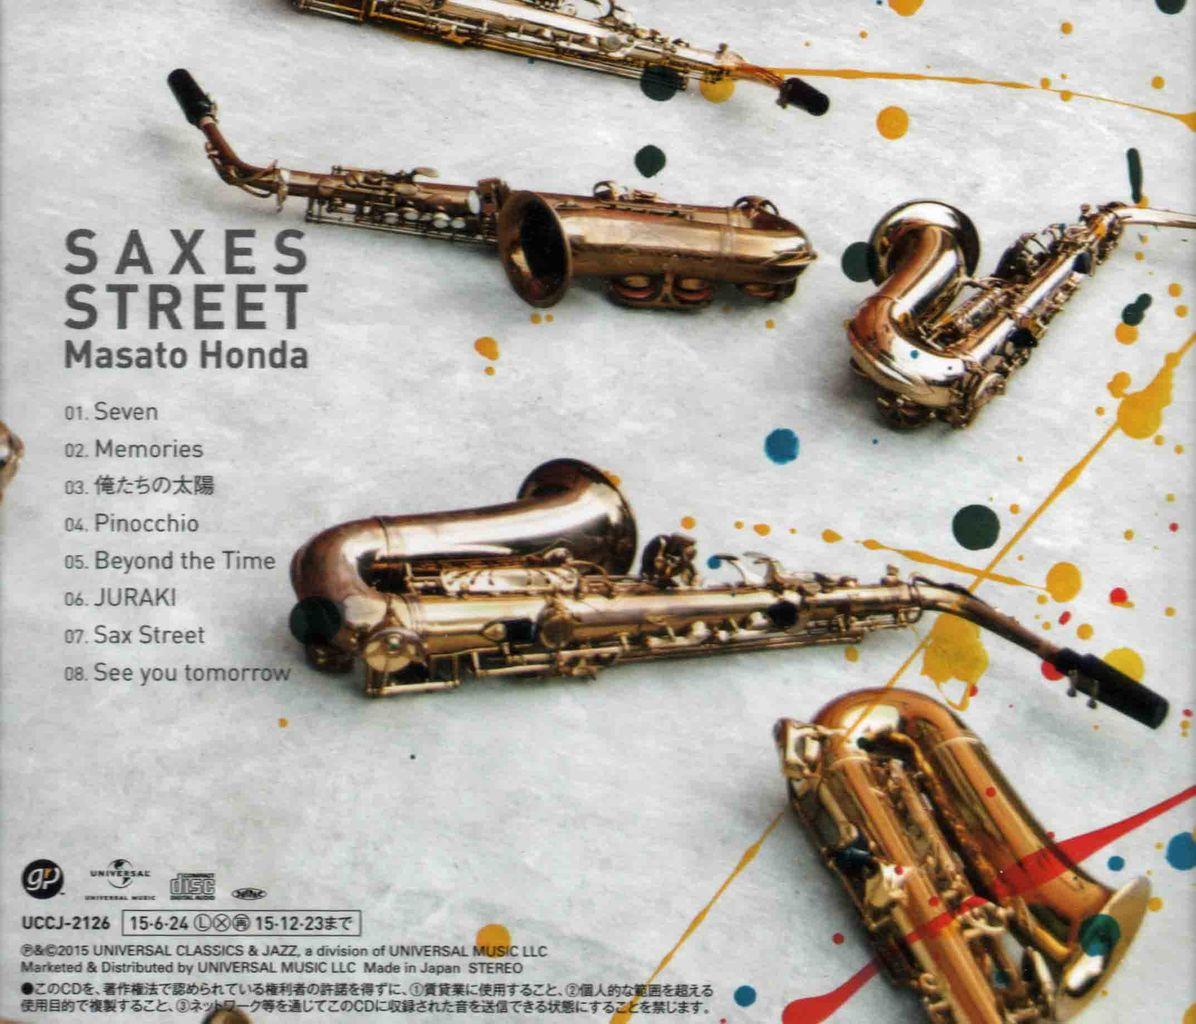 SAXES STREET-2